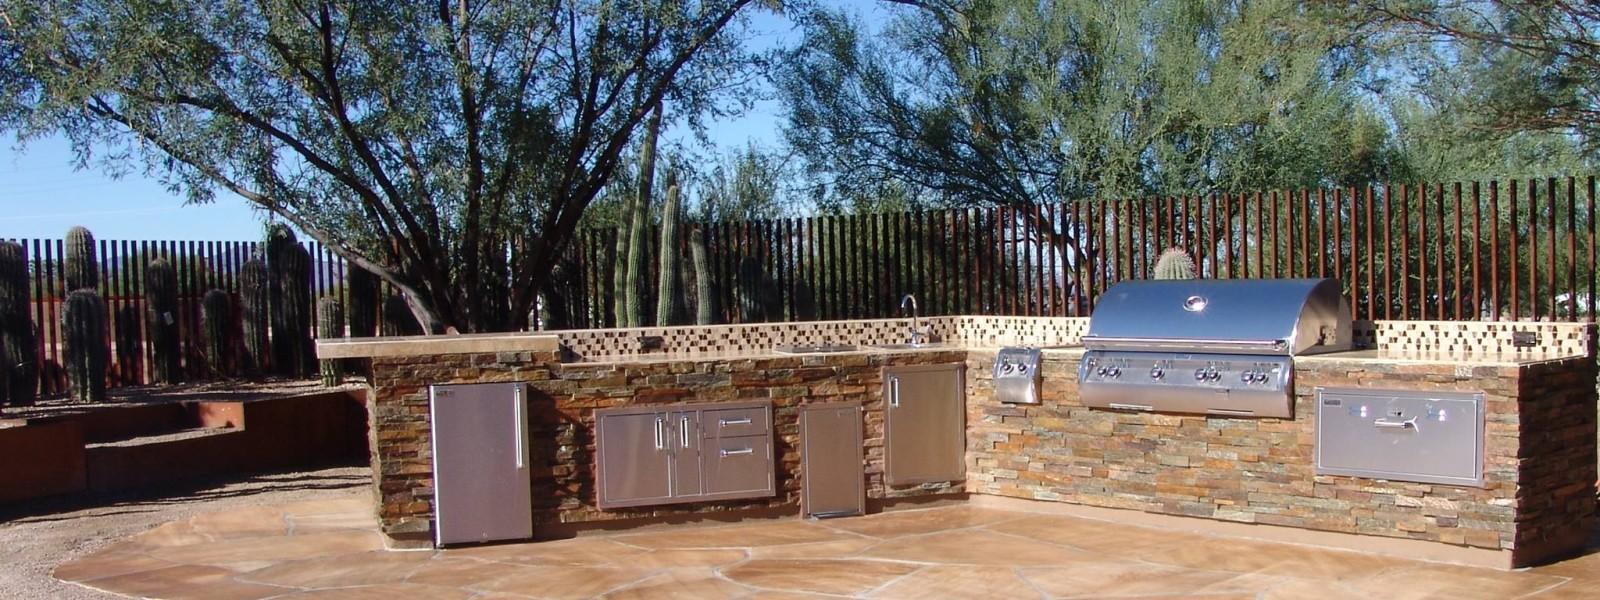 Beau Garden Gate Landscaping Tucson Designs